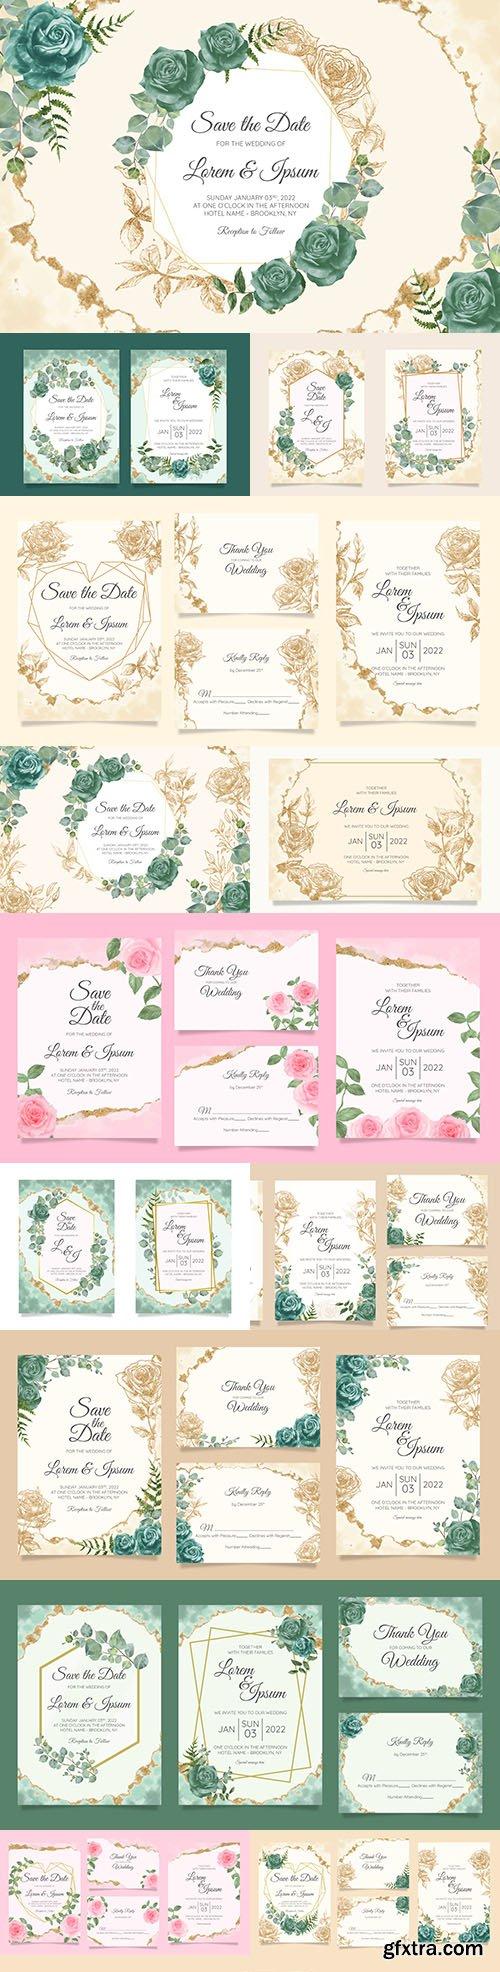 Wedding floral watercolor decorative invitations 21